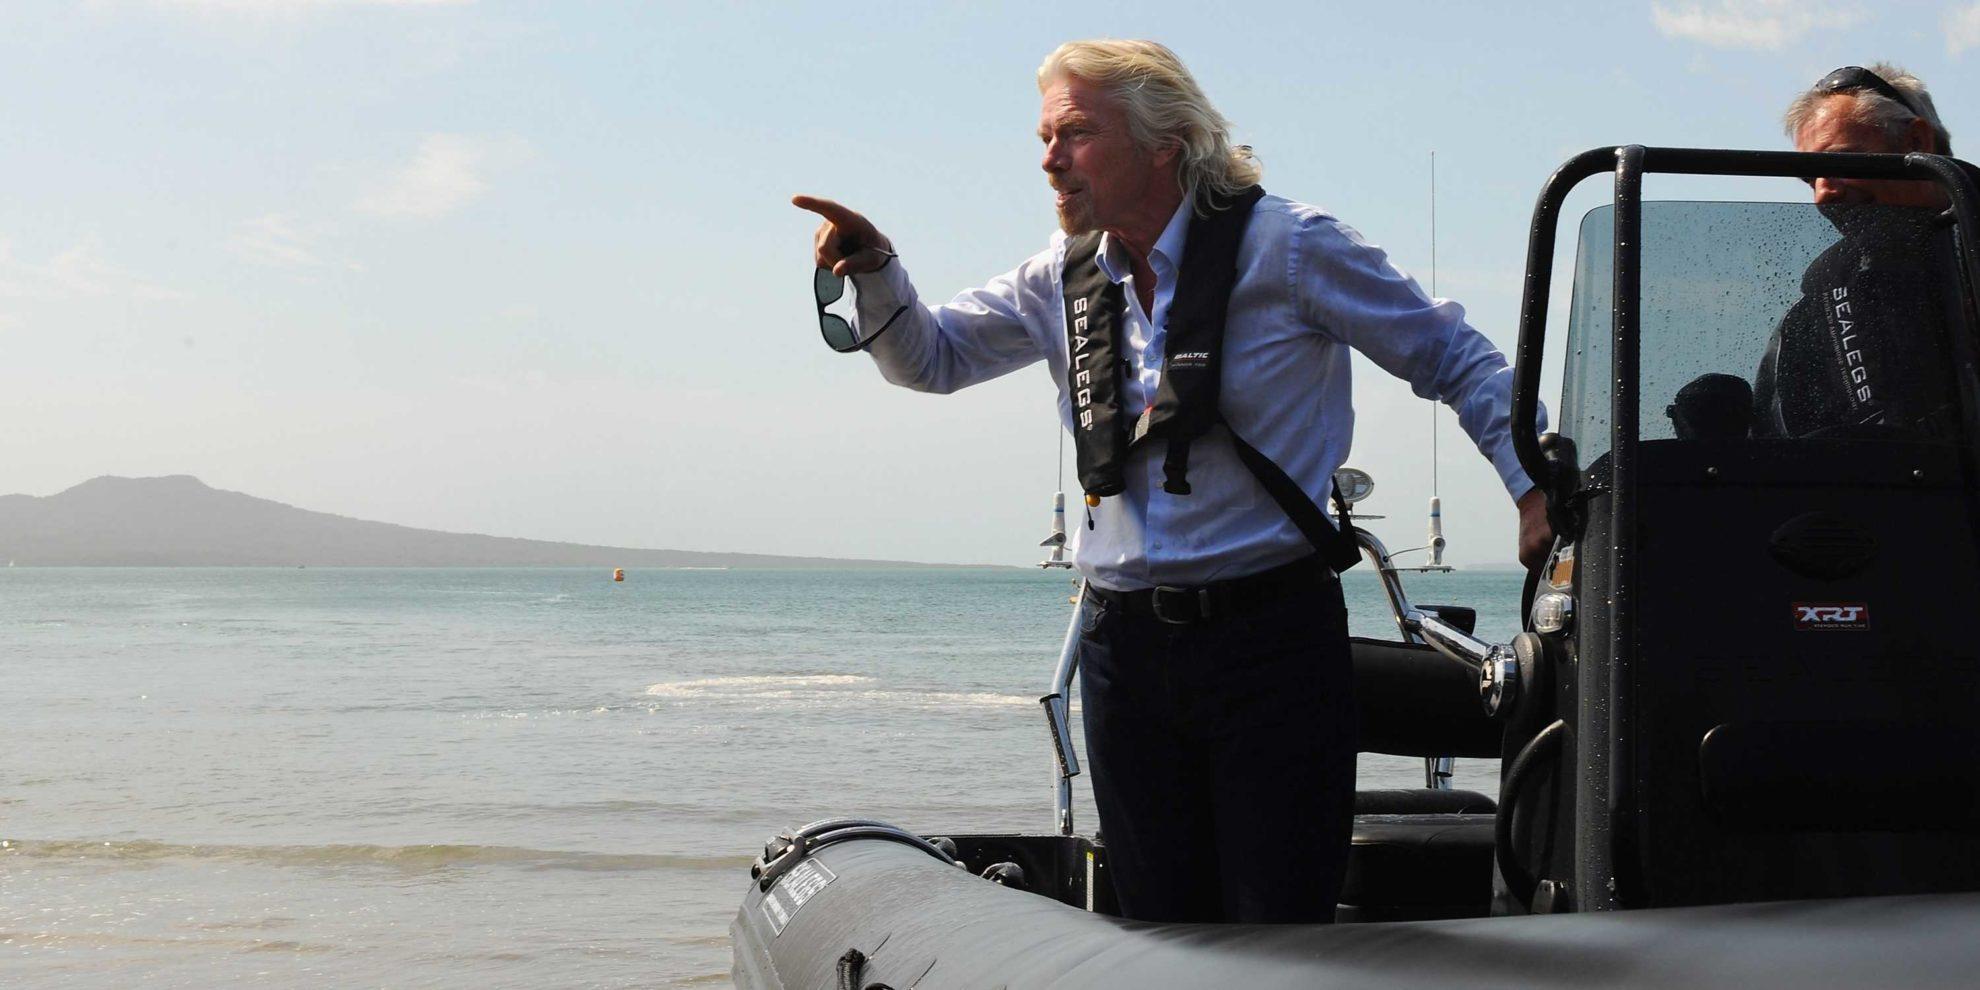 richard-branson-wants-to-start-a-virgin-cruise-line